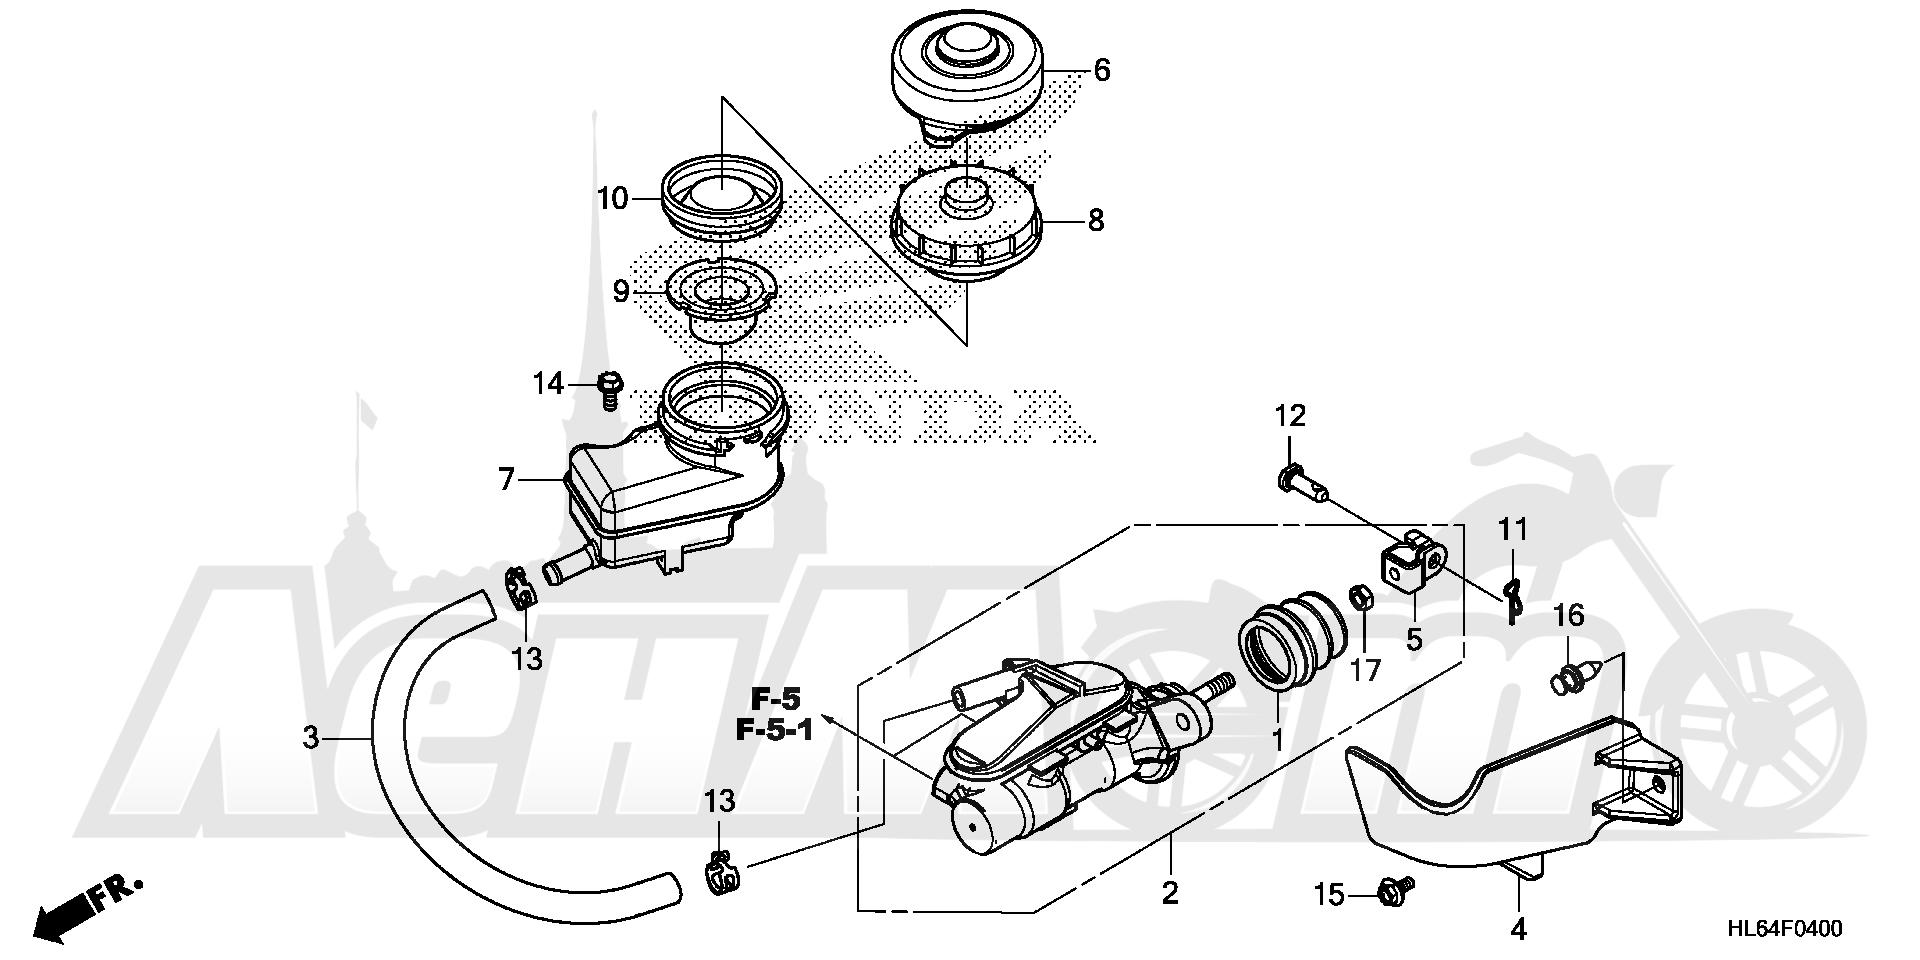 Запчасти для Квадроцикла Honda 2019 SXS1000S2R Раздел: BRAKE MASTER CYLINDER | тормоза главный цилиндр